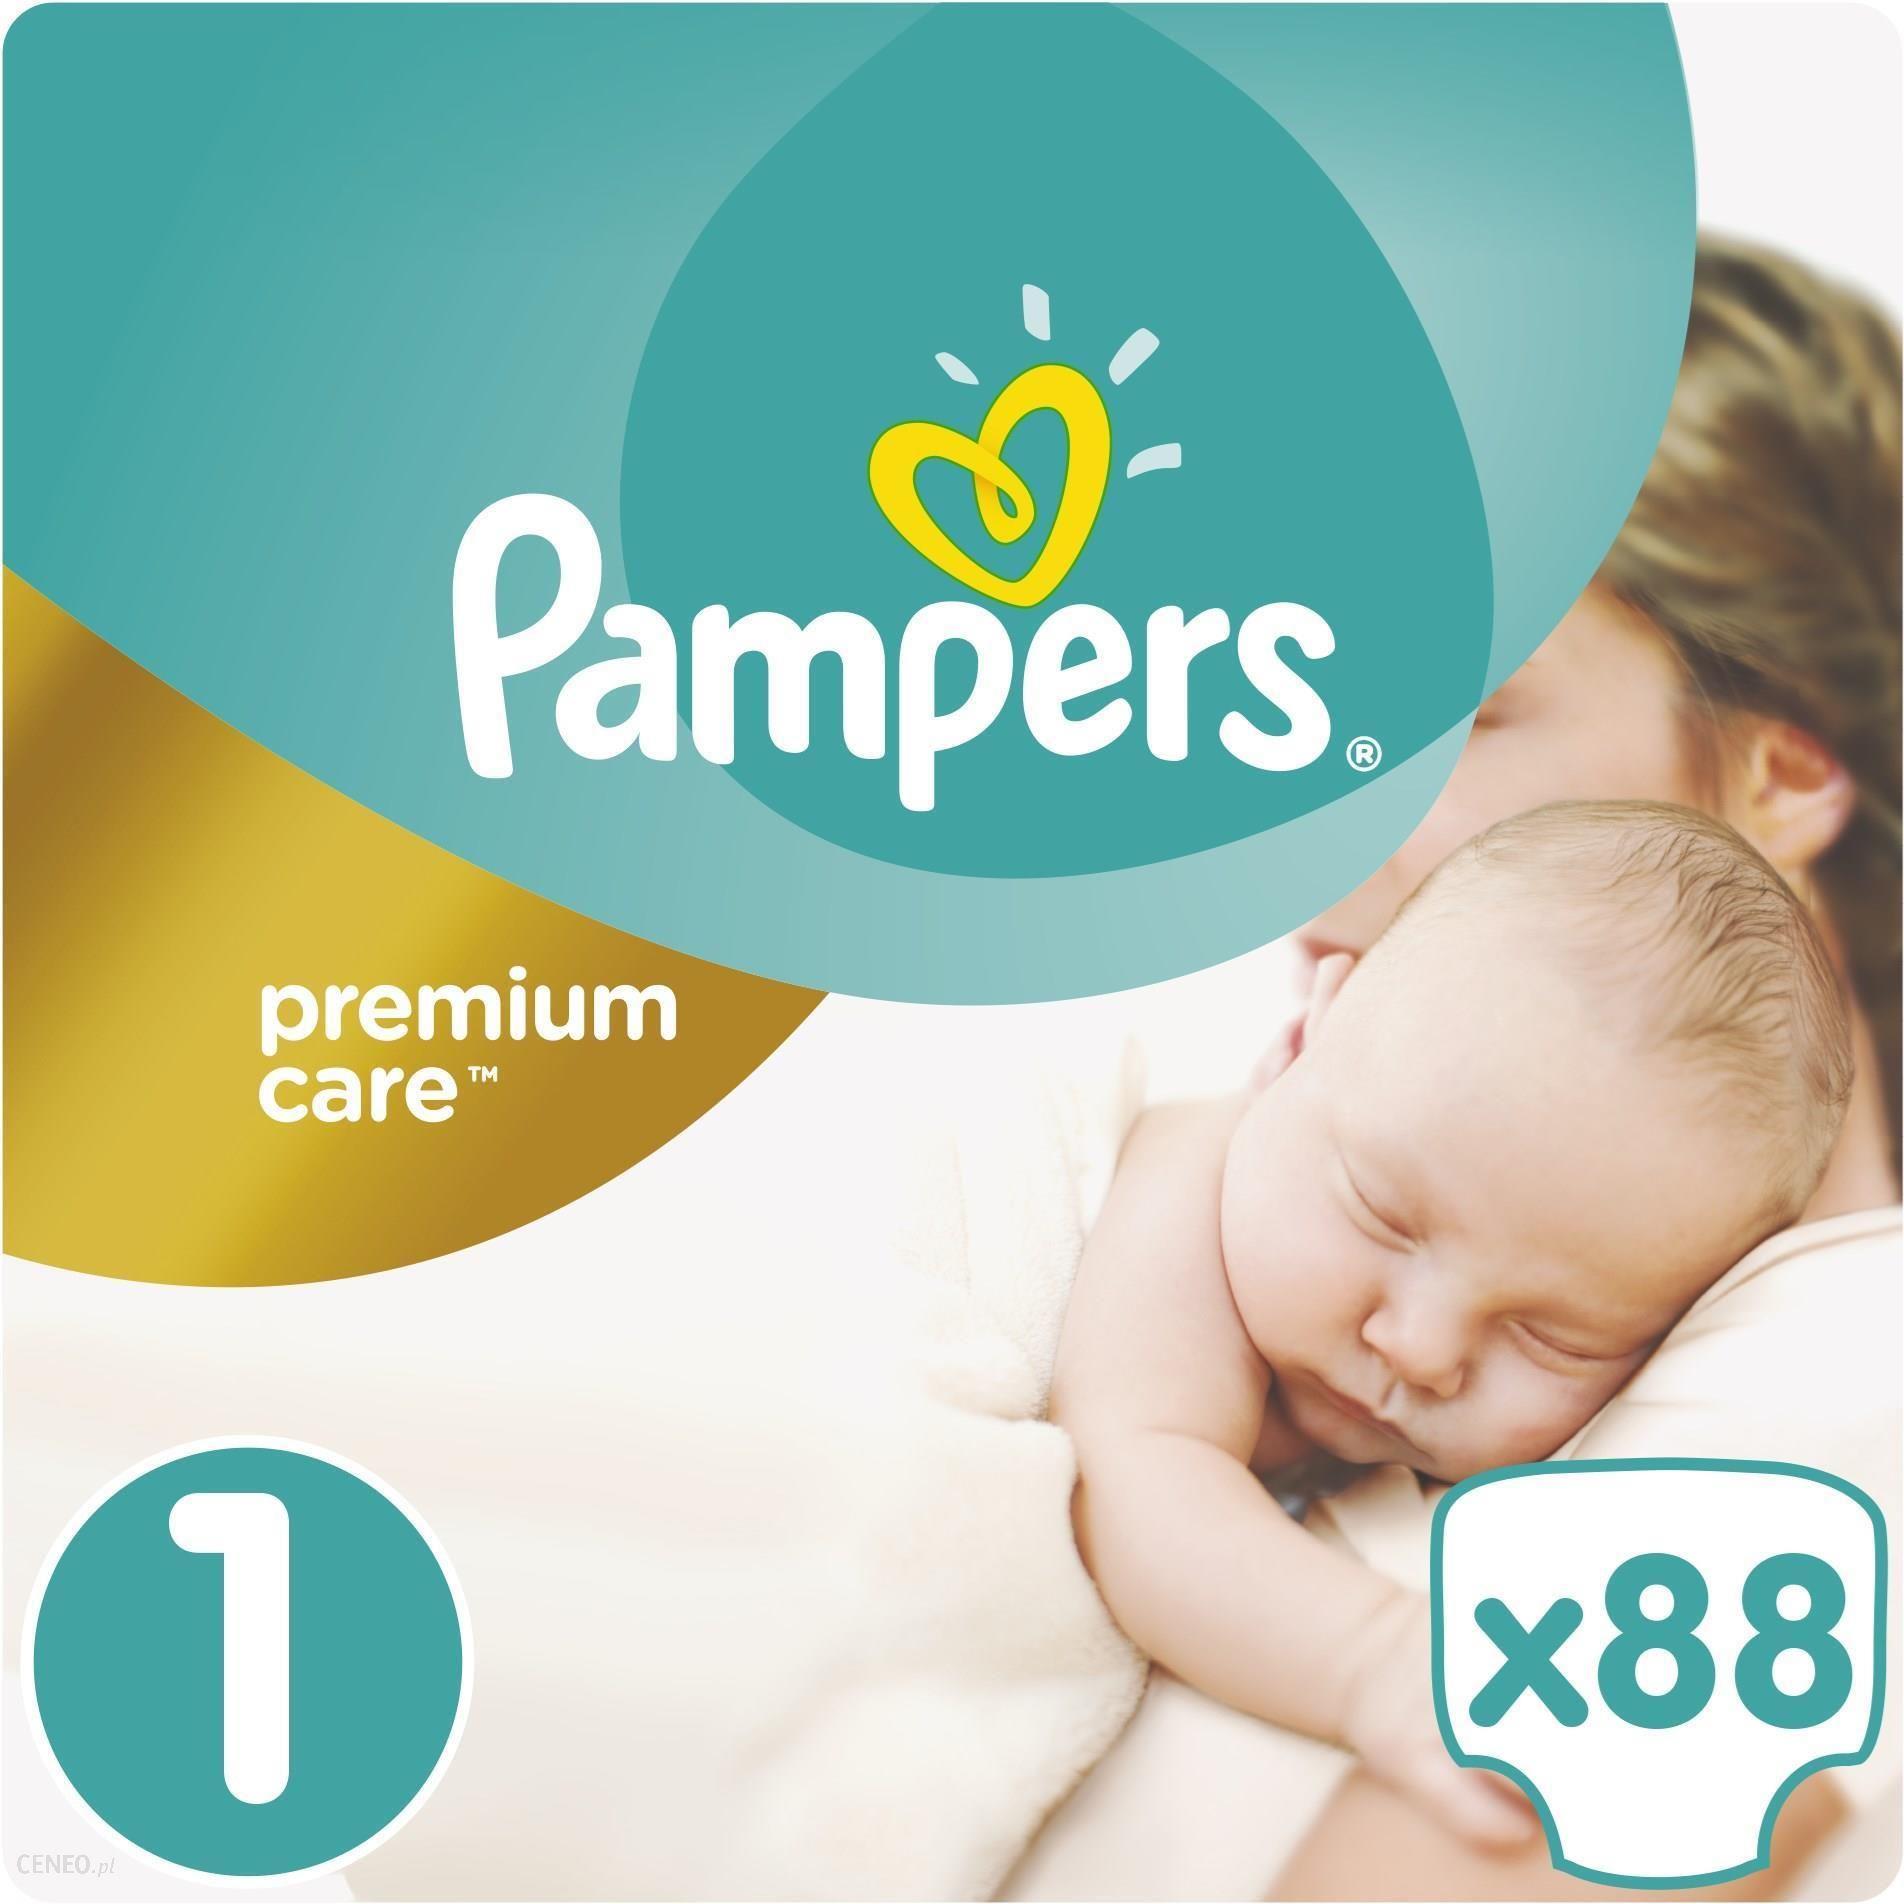 2baad417cd482 Pampers Premium Care rozmiar 1 (Newborn), 2–5 kg, 88 pieluszek ...